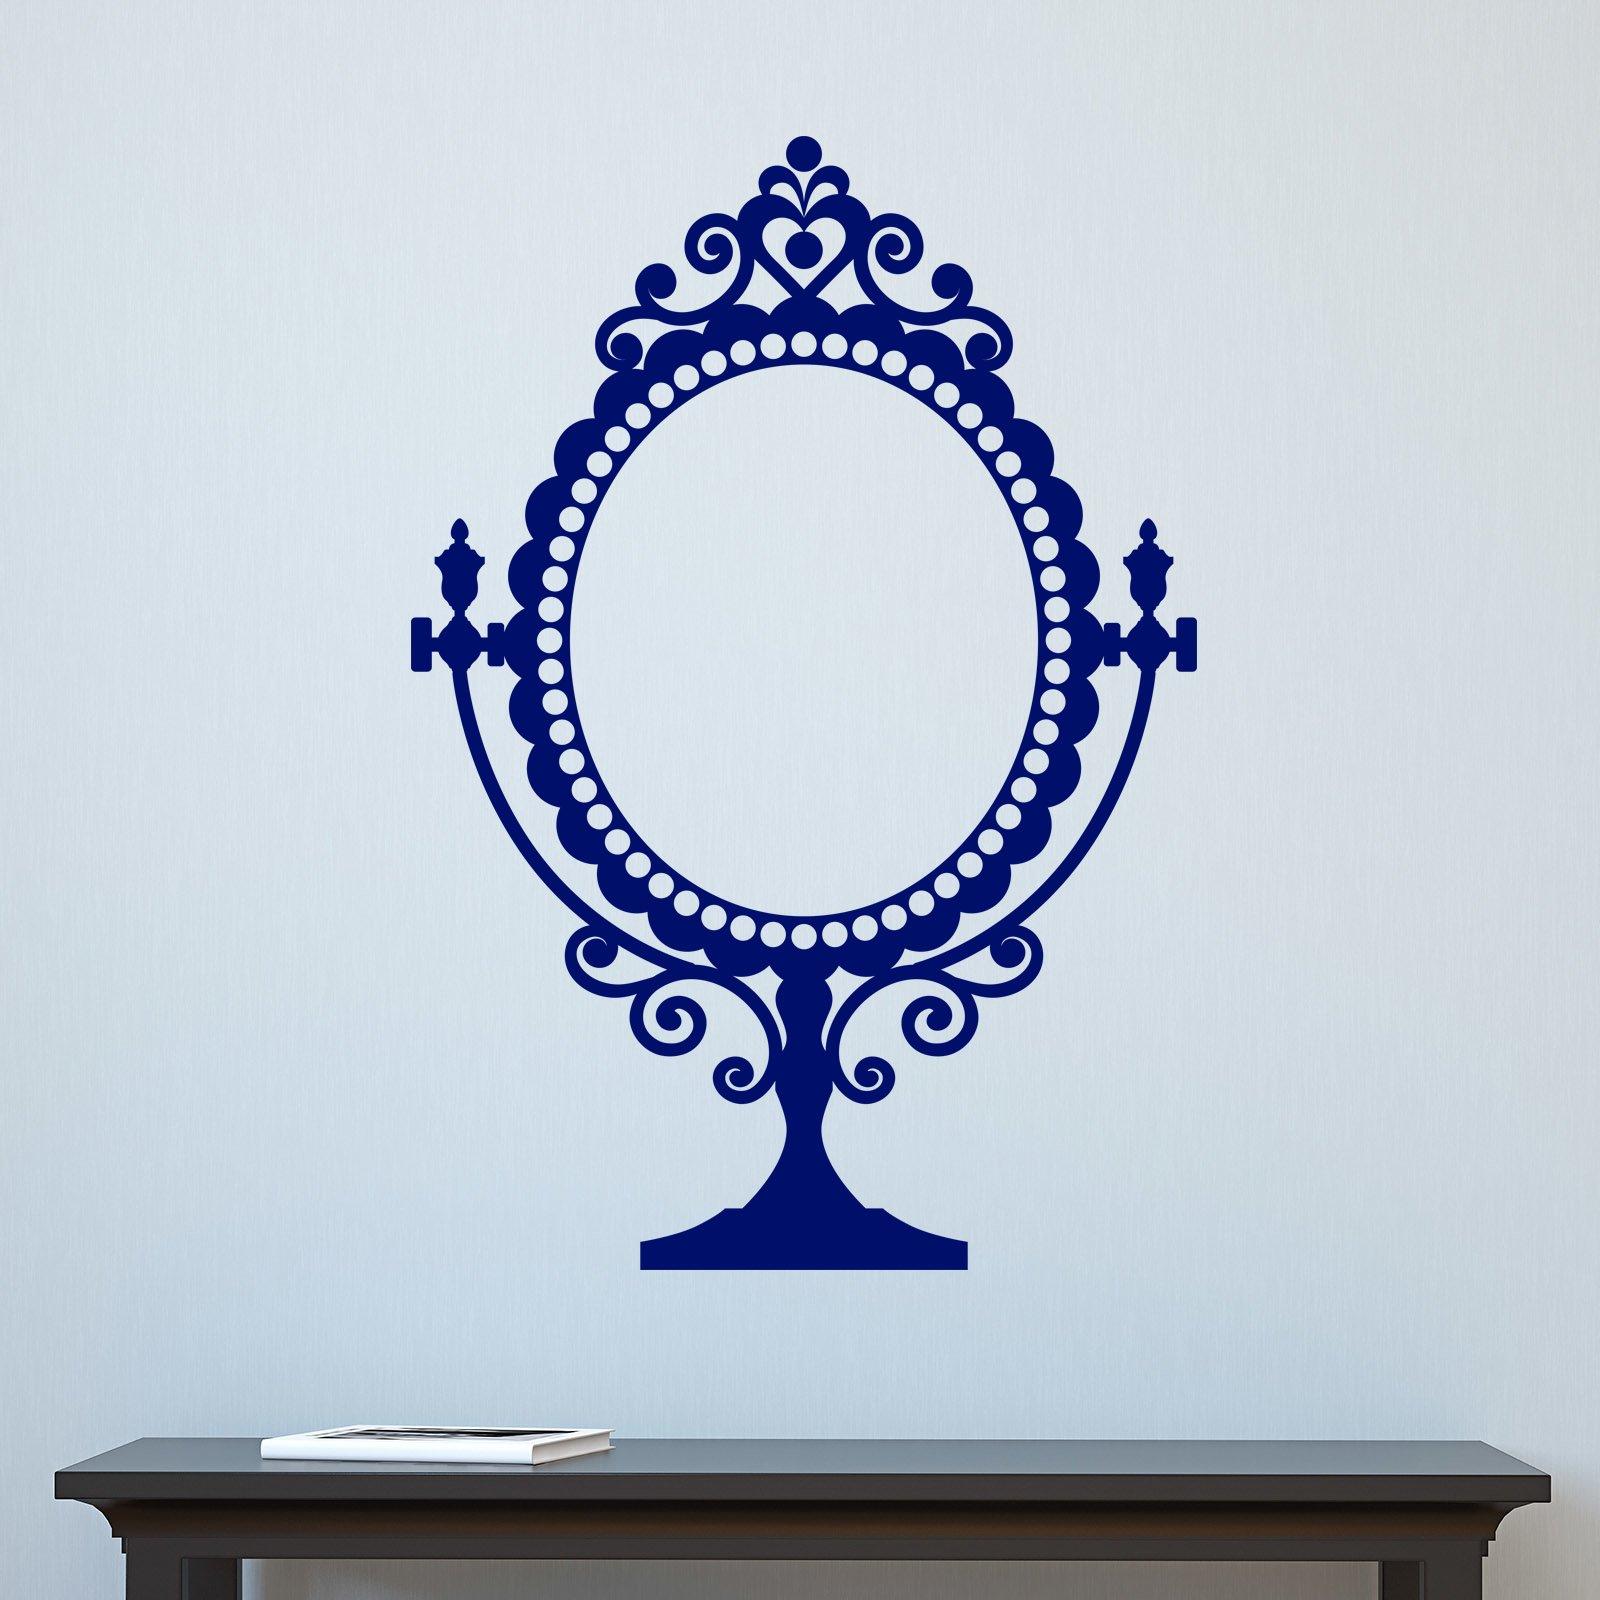 Decorative vintage mirror design wall sticker decal ebay for Mirror stickers